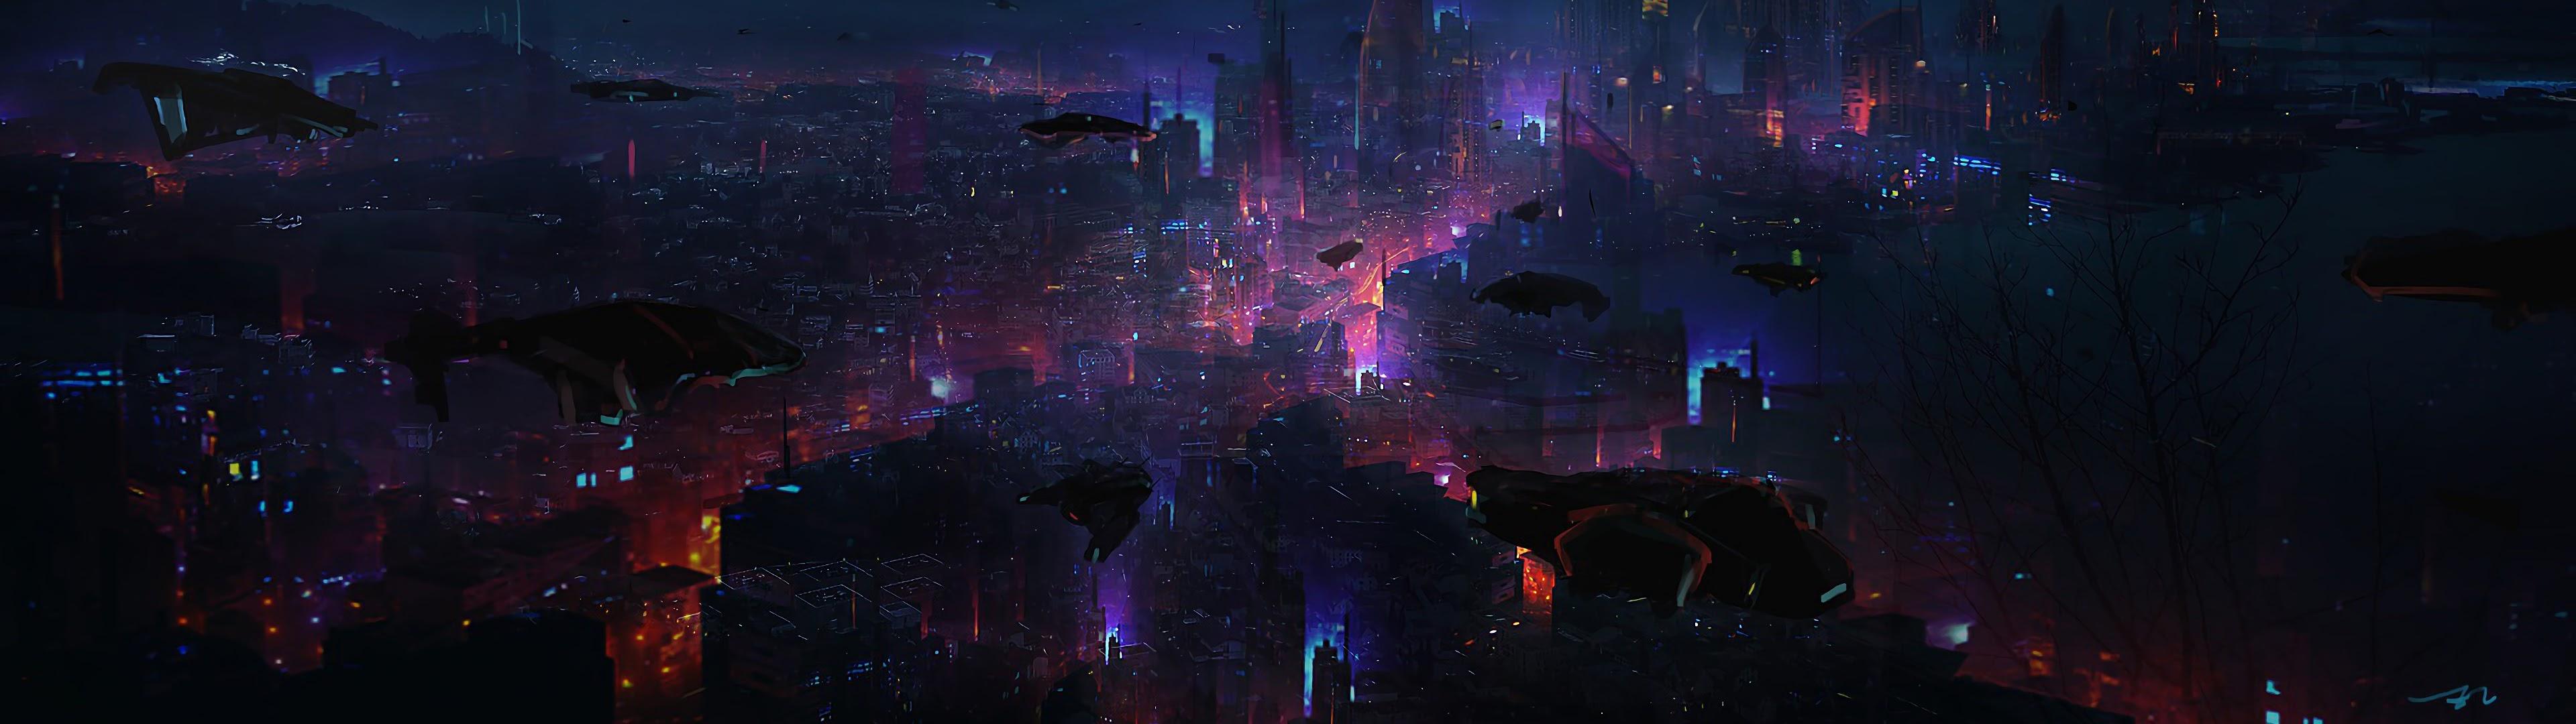 Cyberpunk, City, Night, Scenery, Sci-fi, 4k, - Cyberpunk Wallpaper Dual Monitor - HD Wallpaper